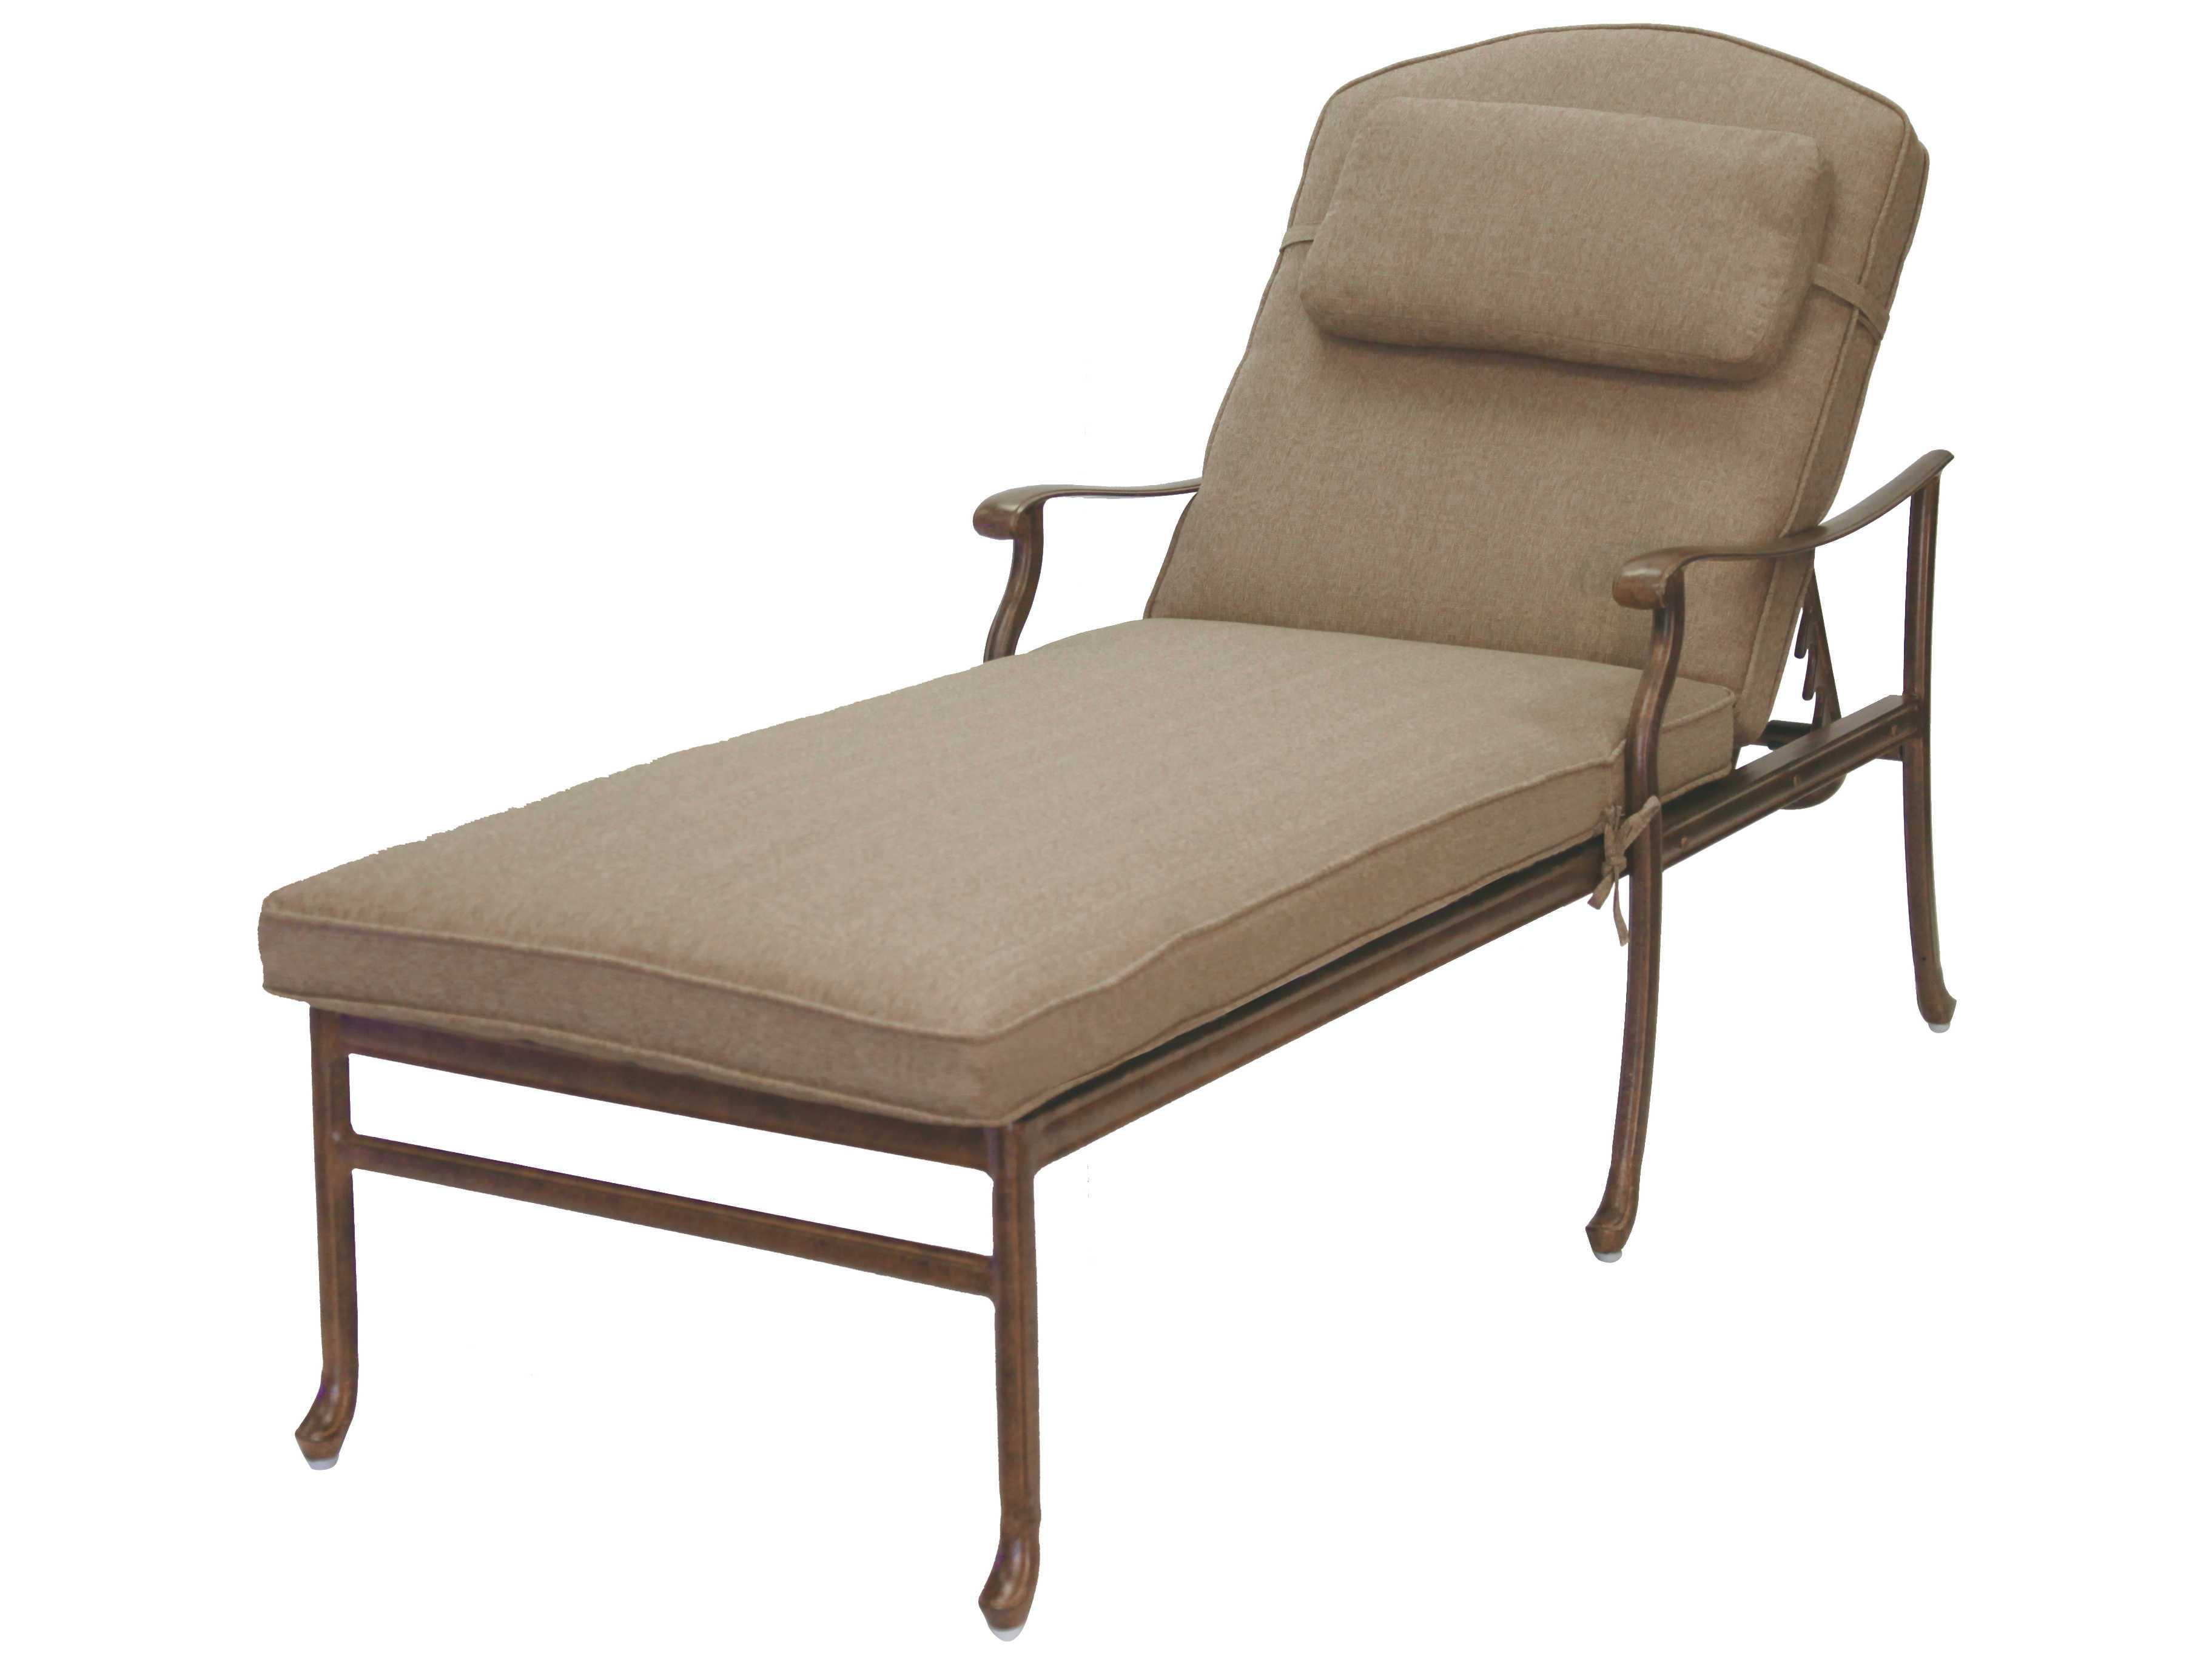 Darlee outdoor living sedona cast aluminum chaise lounge for Aluminum chaise lounge outdoor